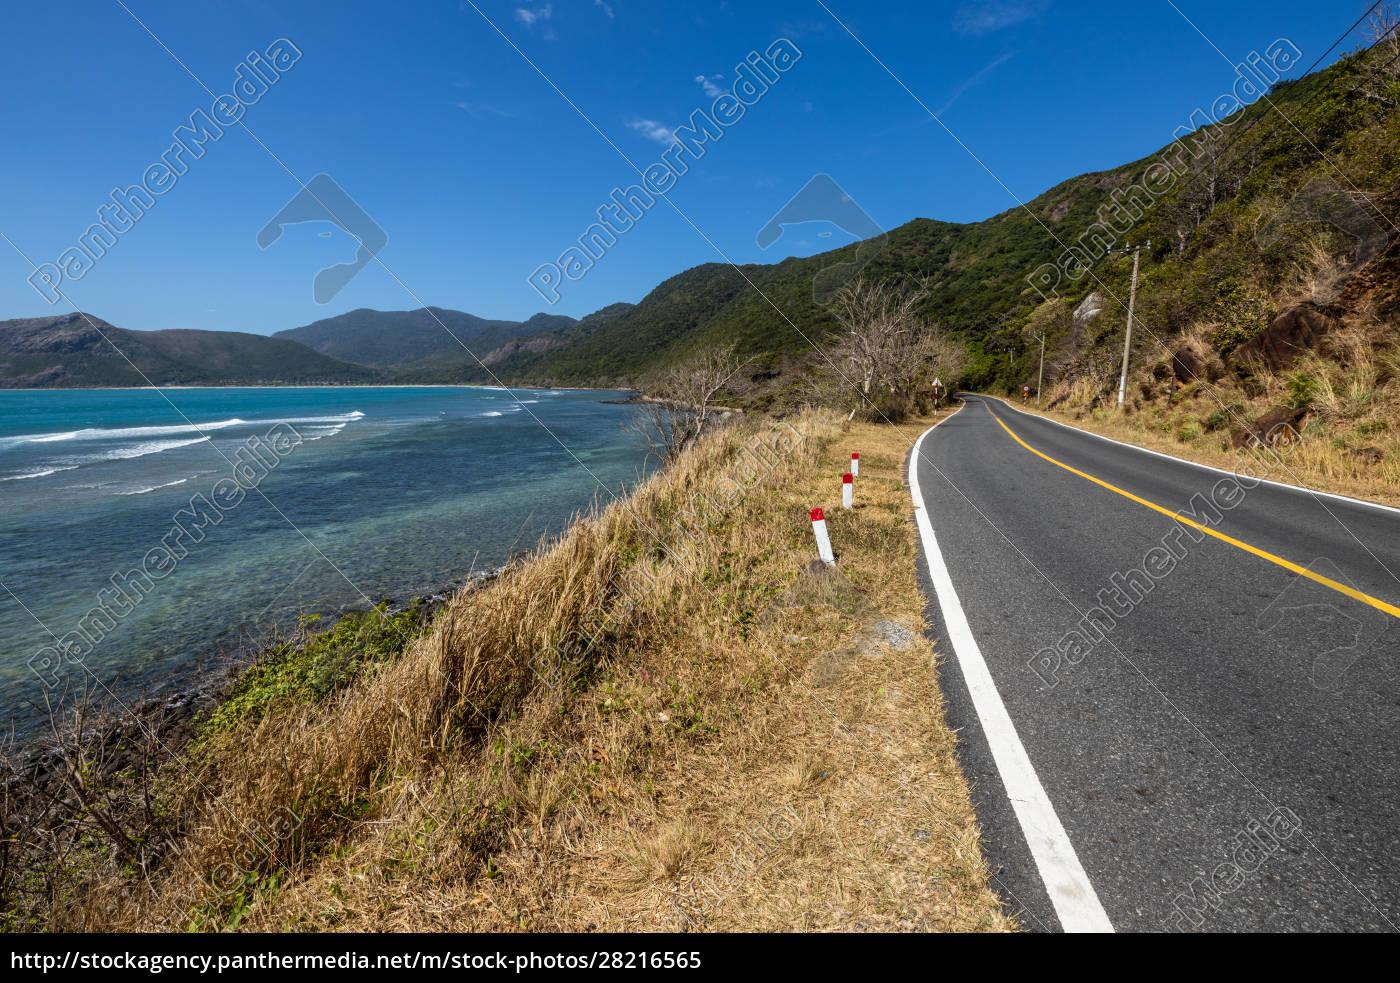 the, coast, of, the, island, con - 28216565